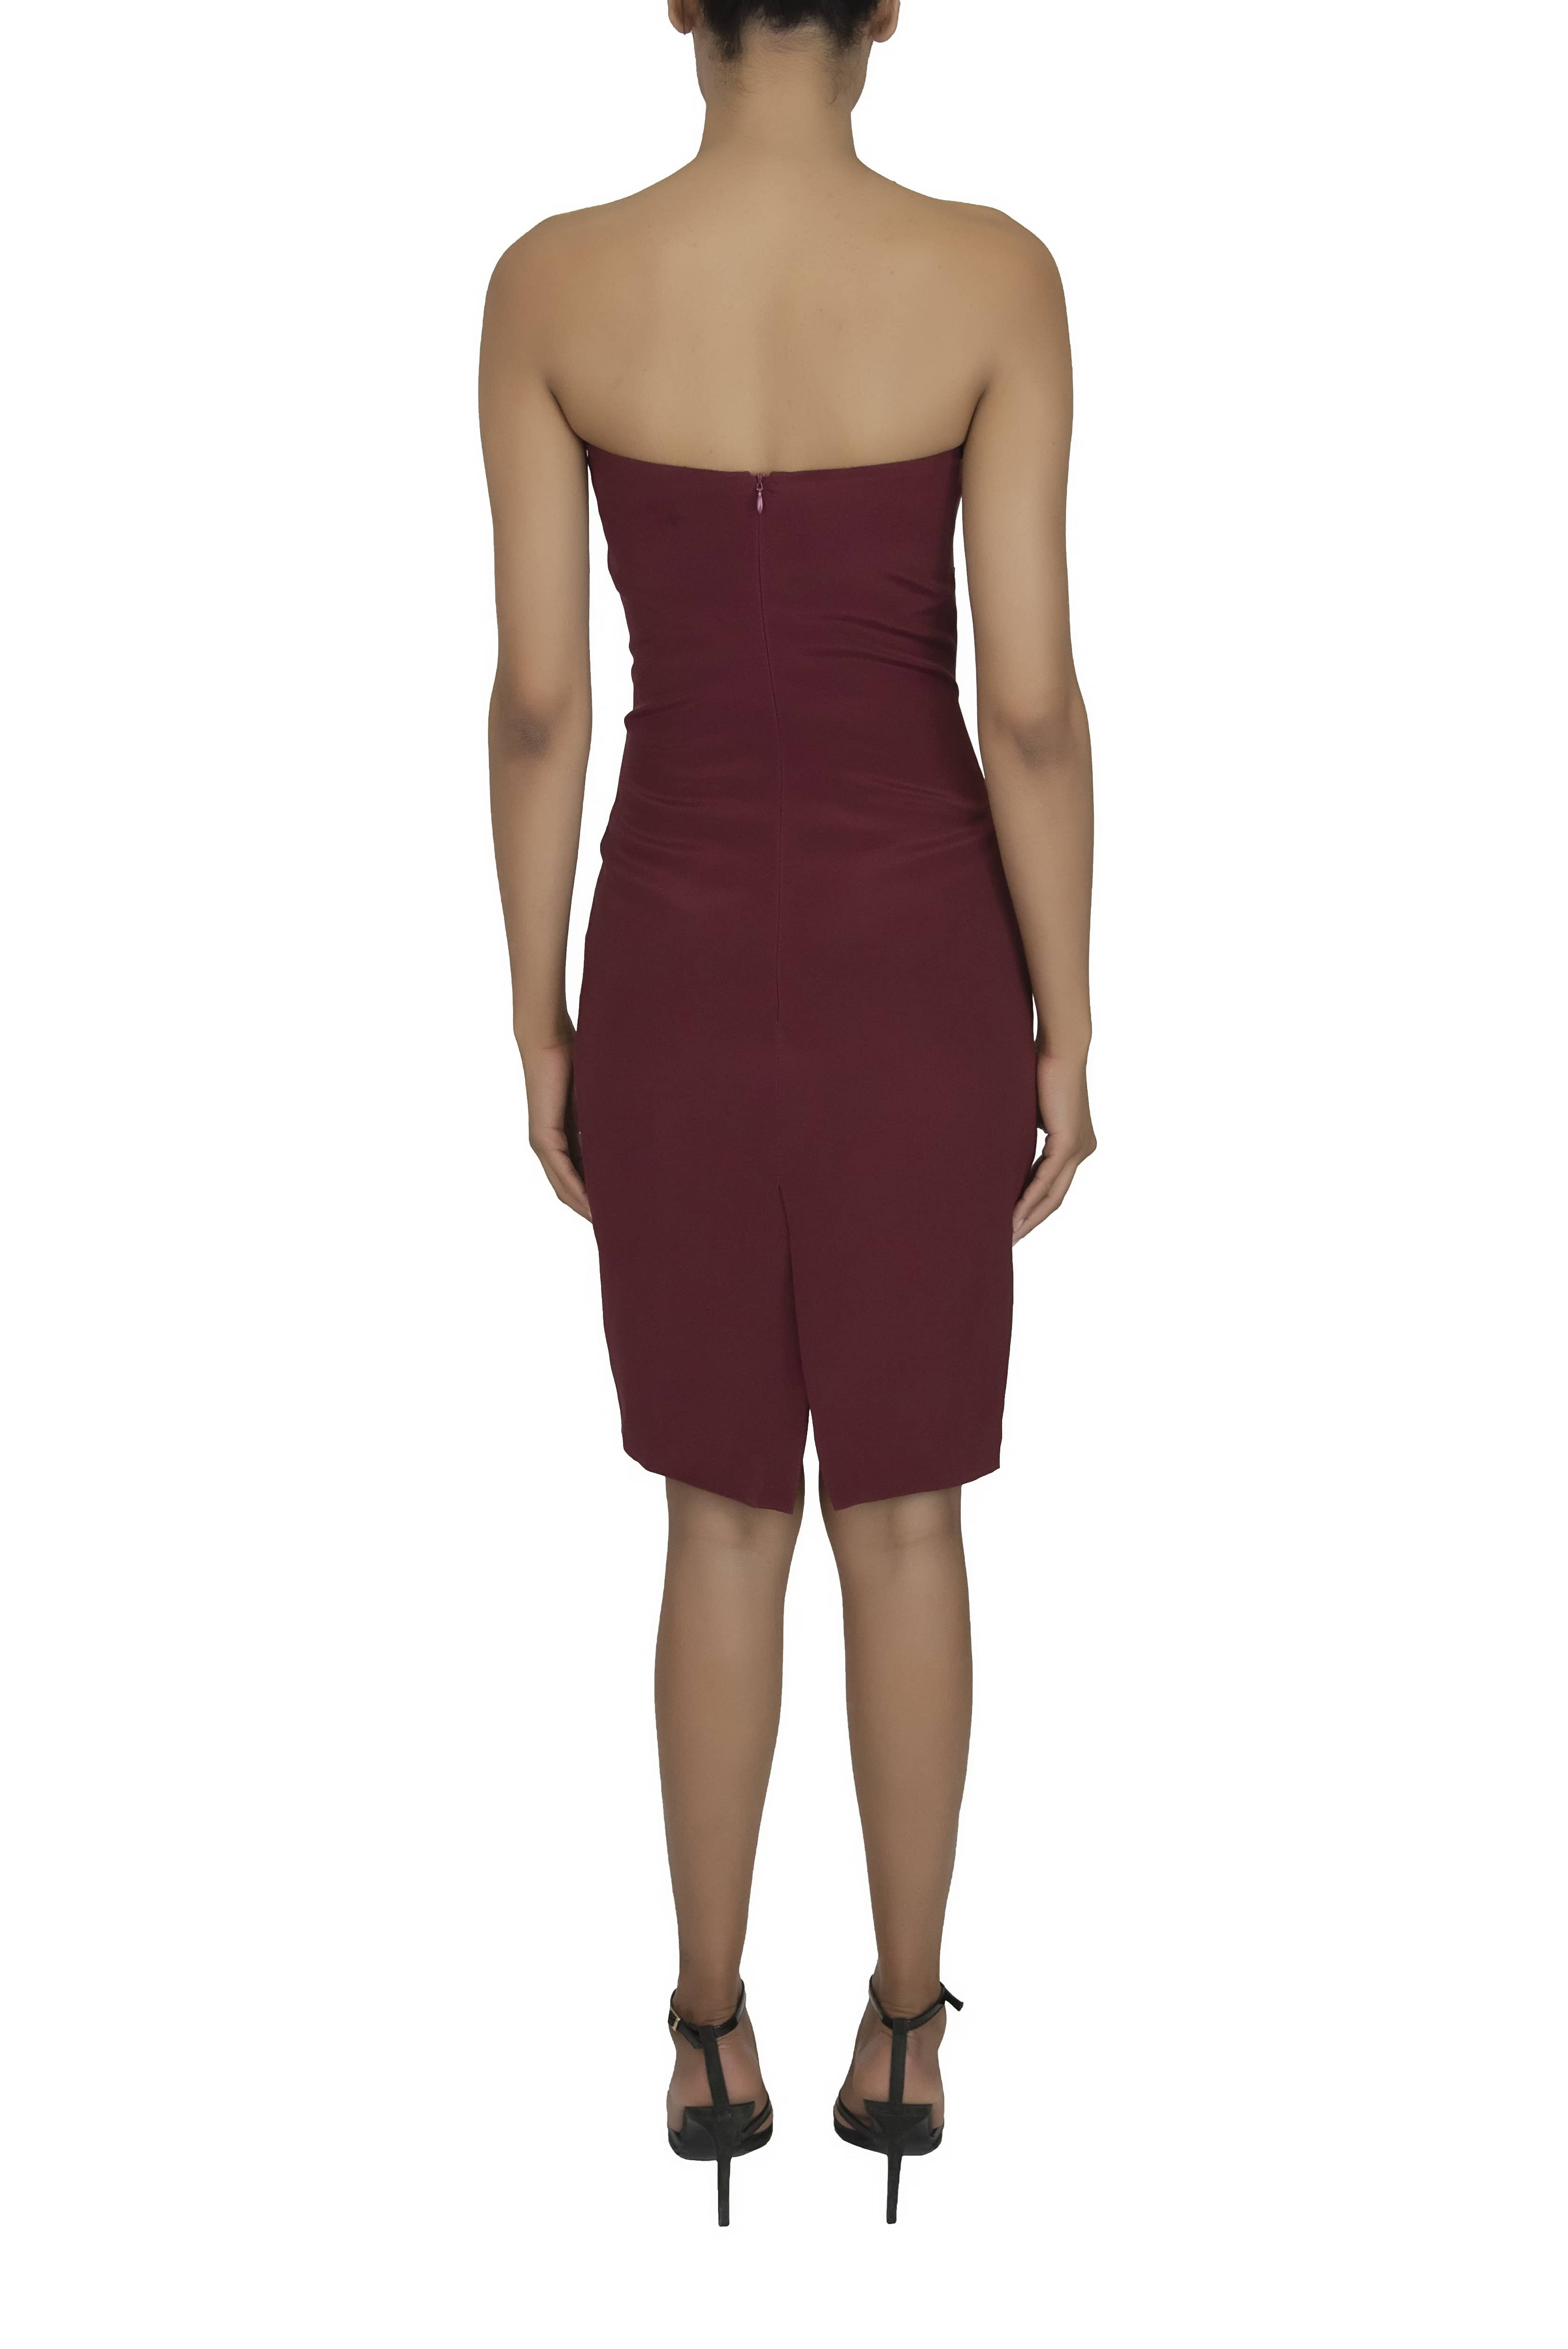 Dress IMAI II 2